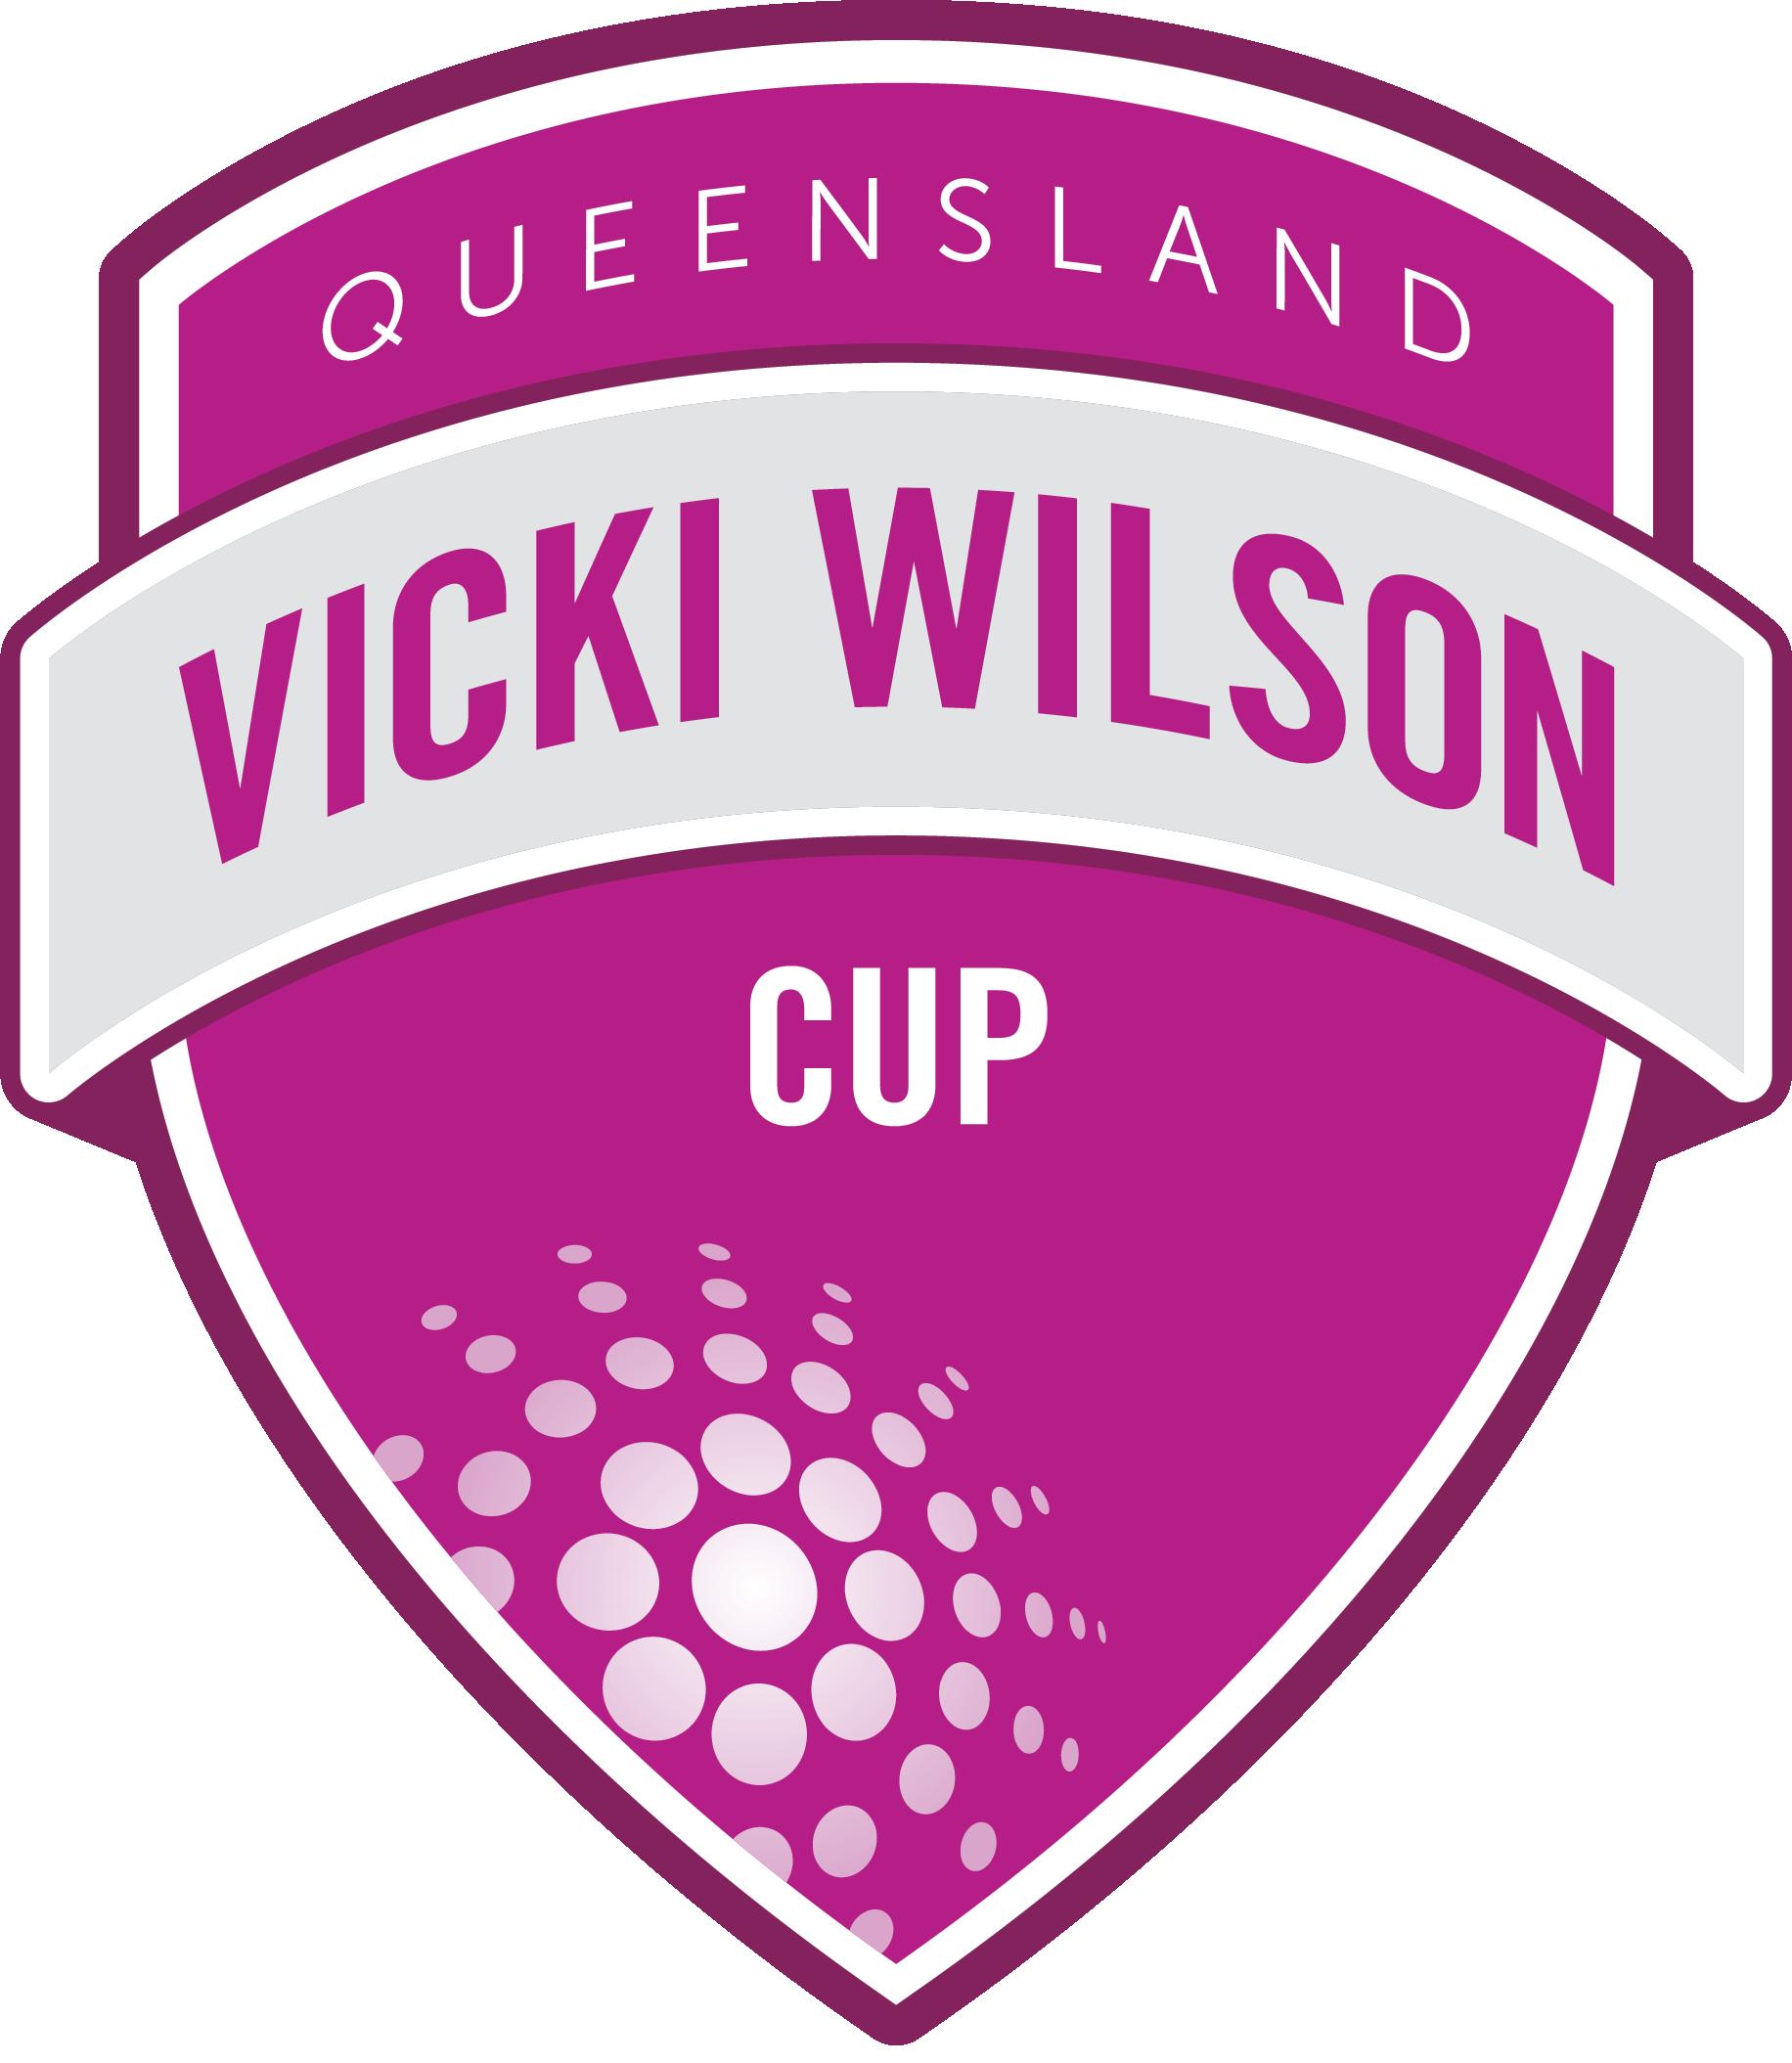 Sports clipart champions. Vicki wilson championship netball